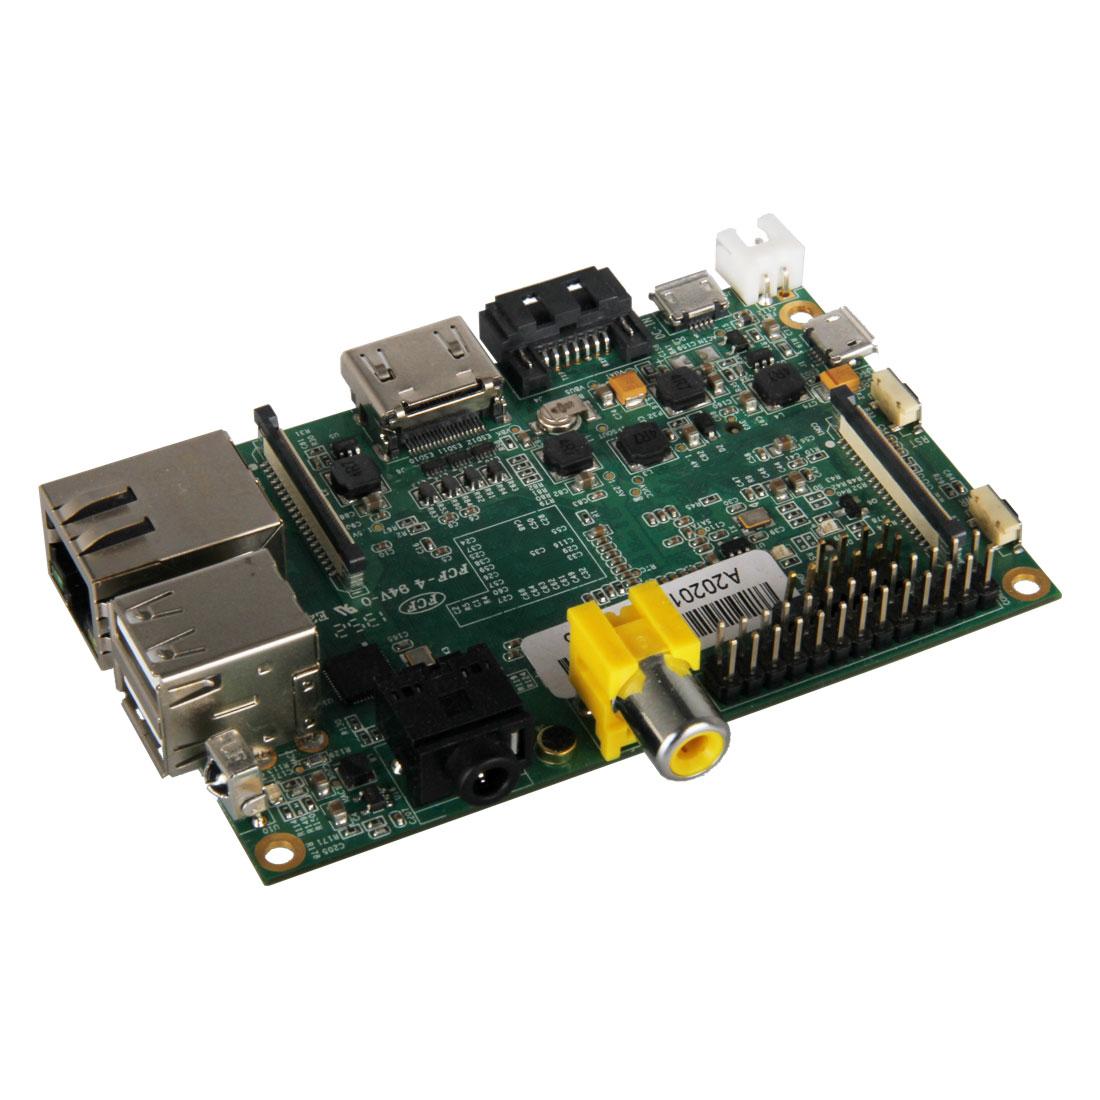 Carte mère Banana Pi M1 Carte mère avec processeur ARM Cortex A7 Dual-Core 1 GHz - RAM 1024 Mo - GPU ARM Mali400MP2 - RJ45 - HDMI - 2x USB 2.0 - SATA